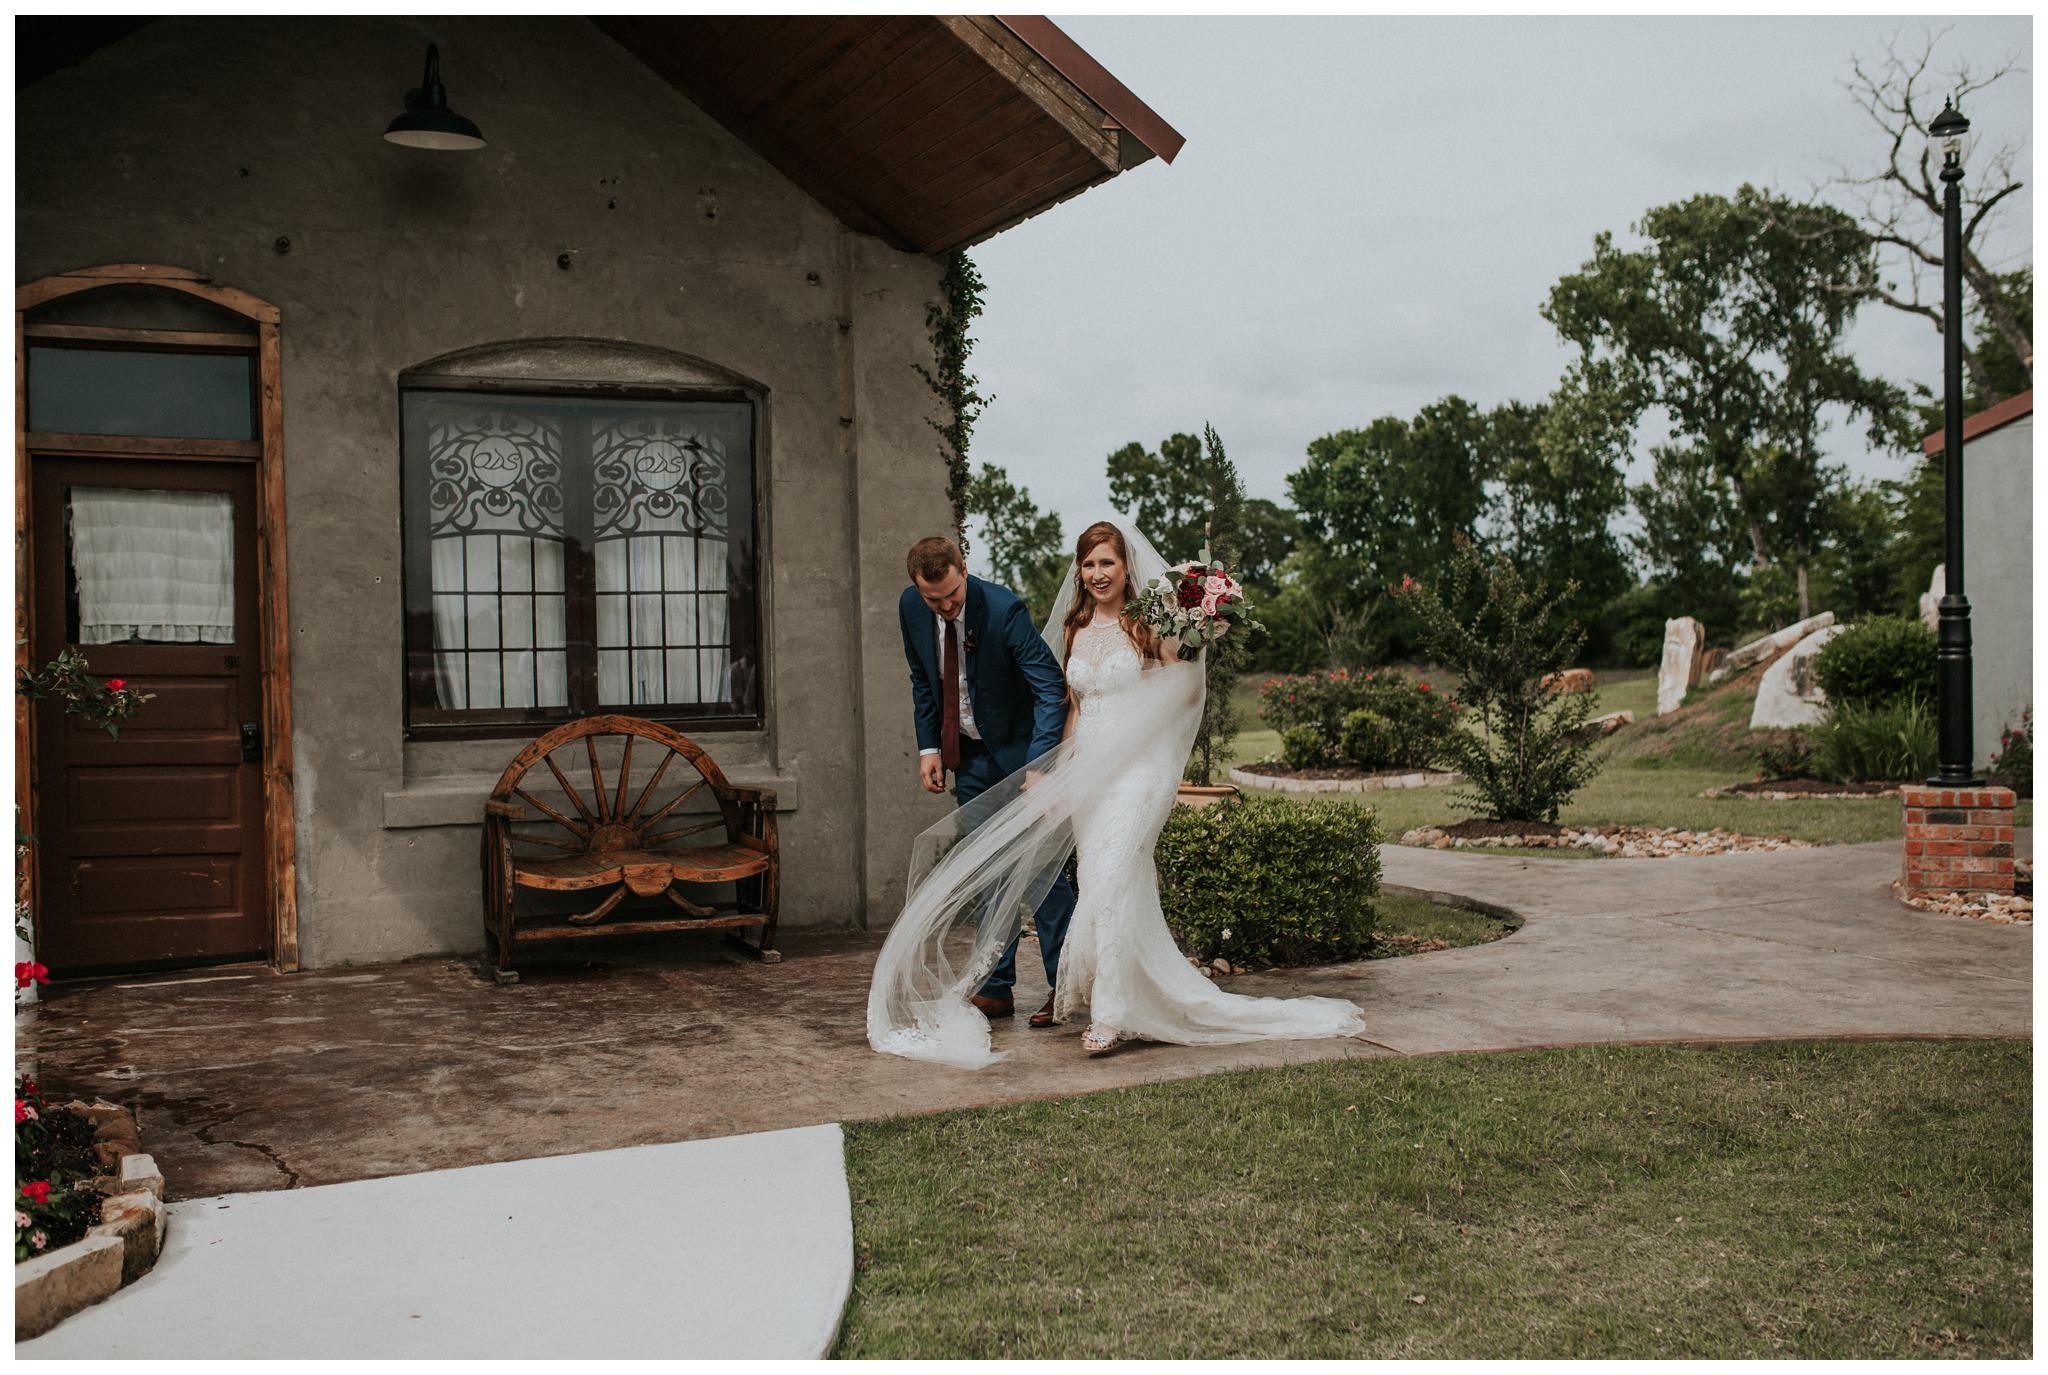 Summertime Olde Dobbin Station - Magnolia Wedding - The Woodlands Texas Wedding Photographer-2539.jpg